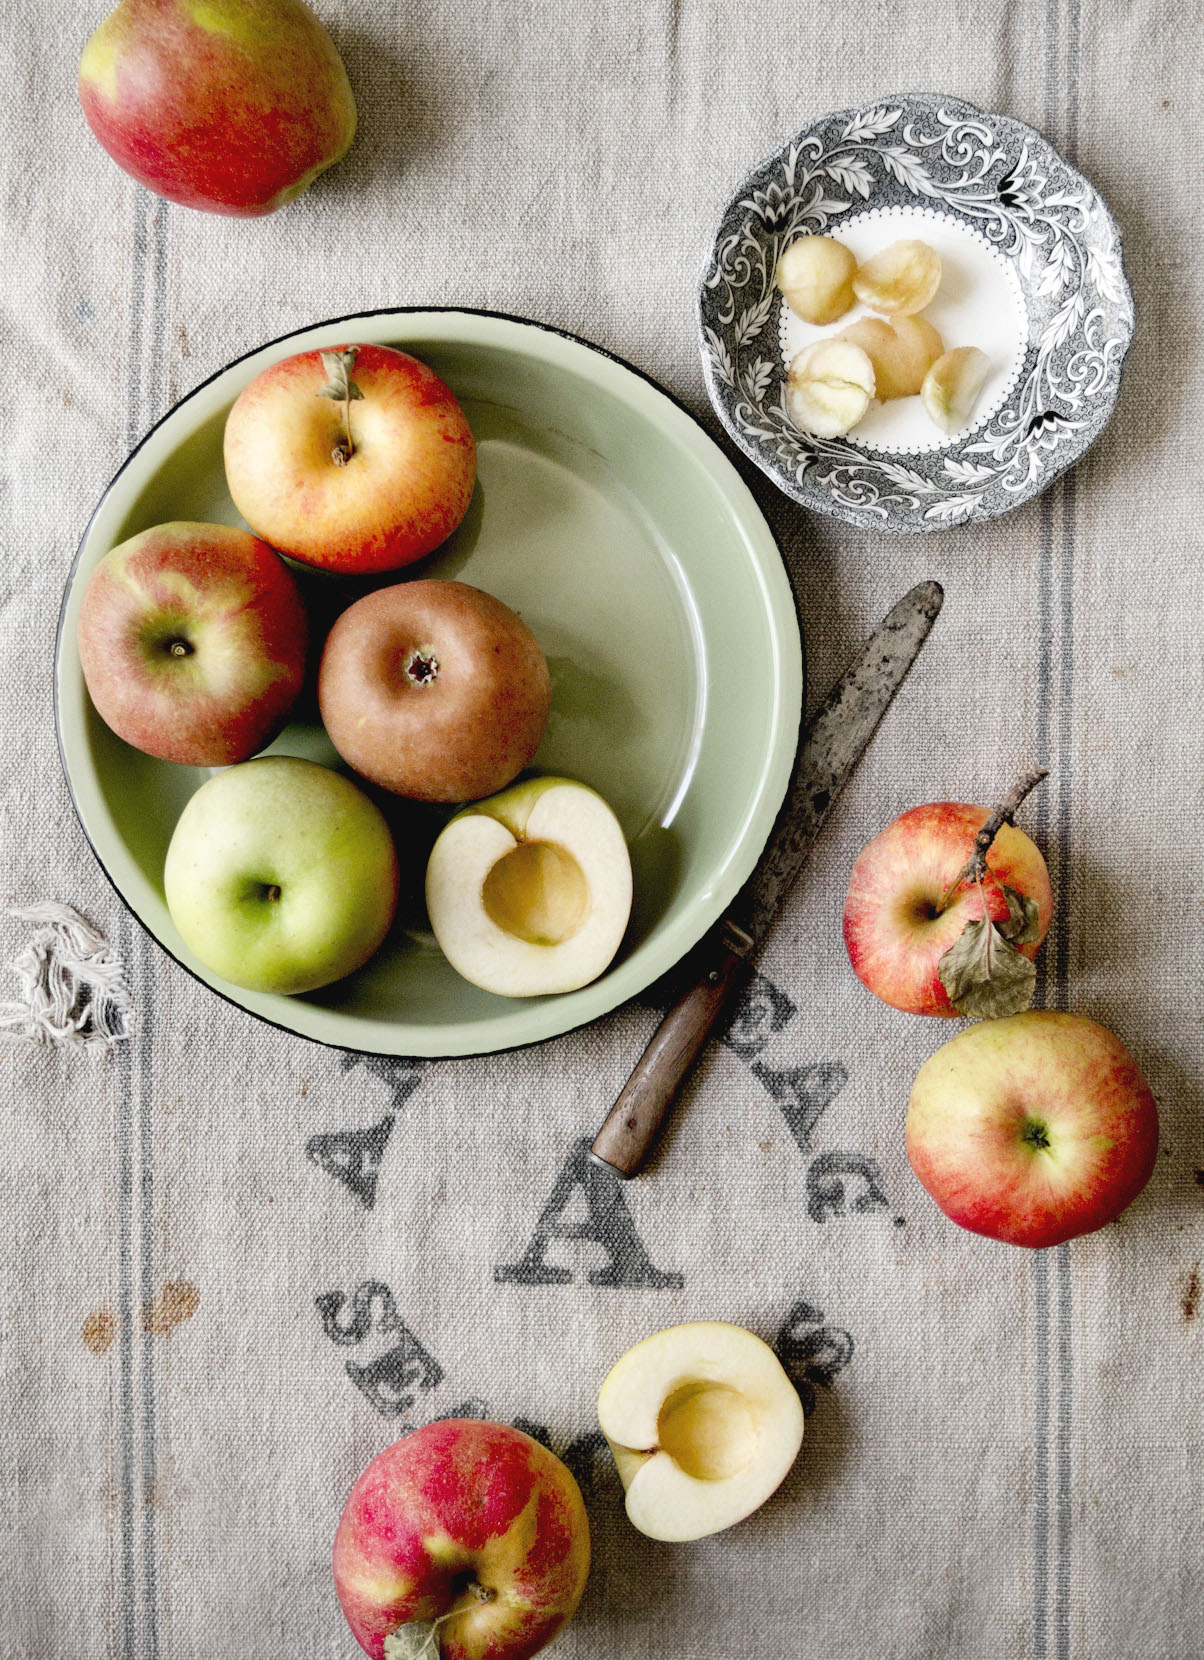 rustic-autumn-apples-making-homemade-applesauce.jpg